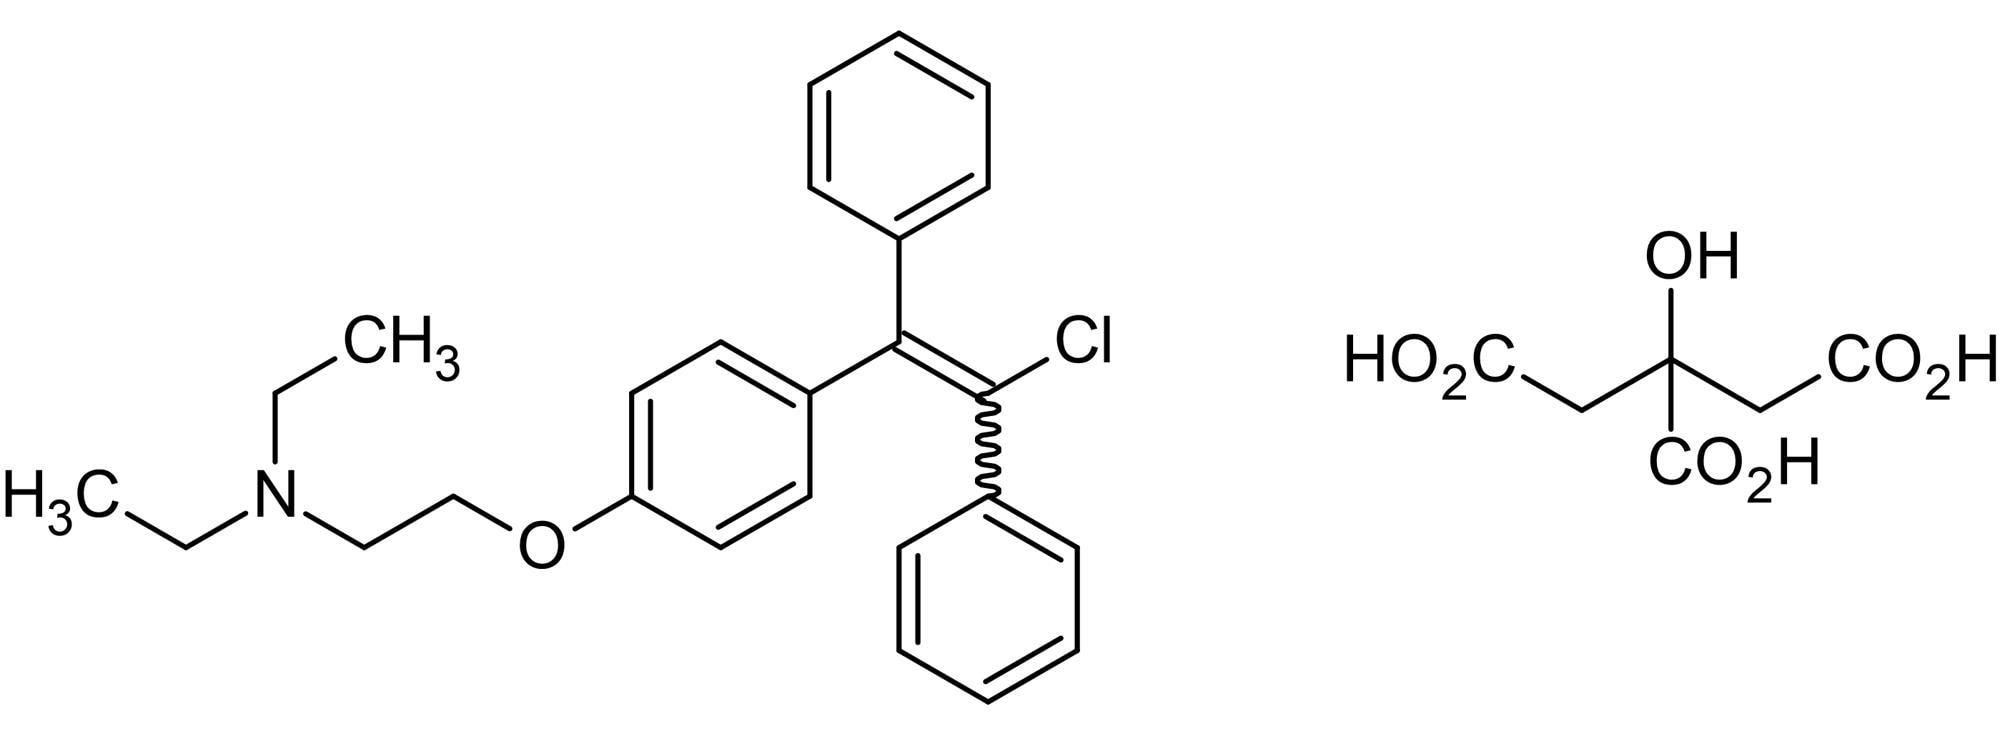 Chemical Structure - Clomiphene citrate, Estrogen receptor modulator (SERM) (ab141183)